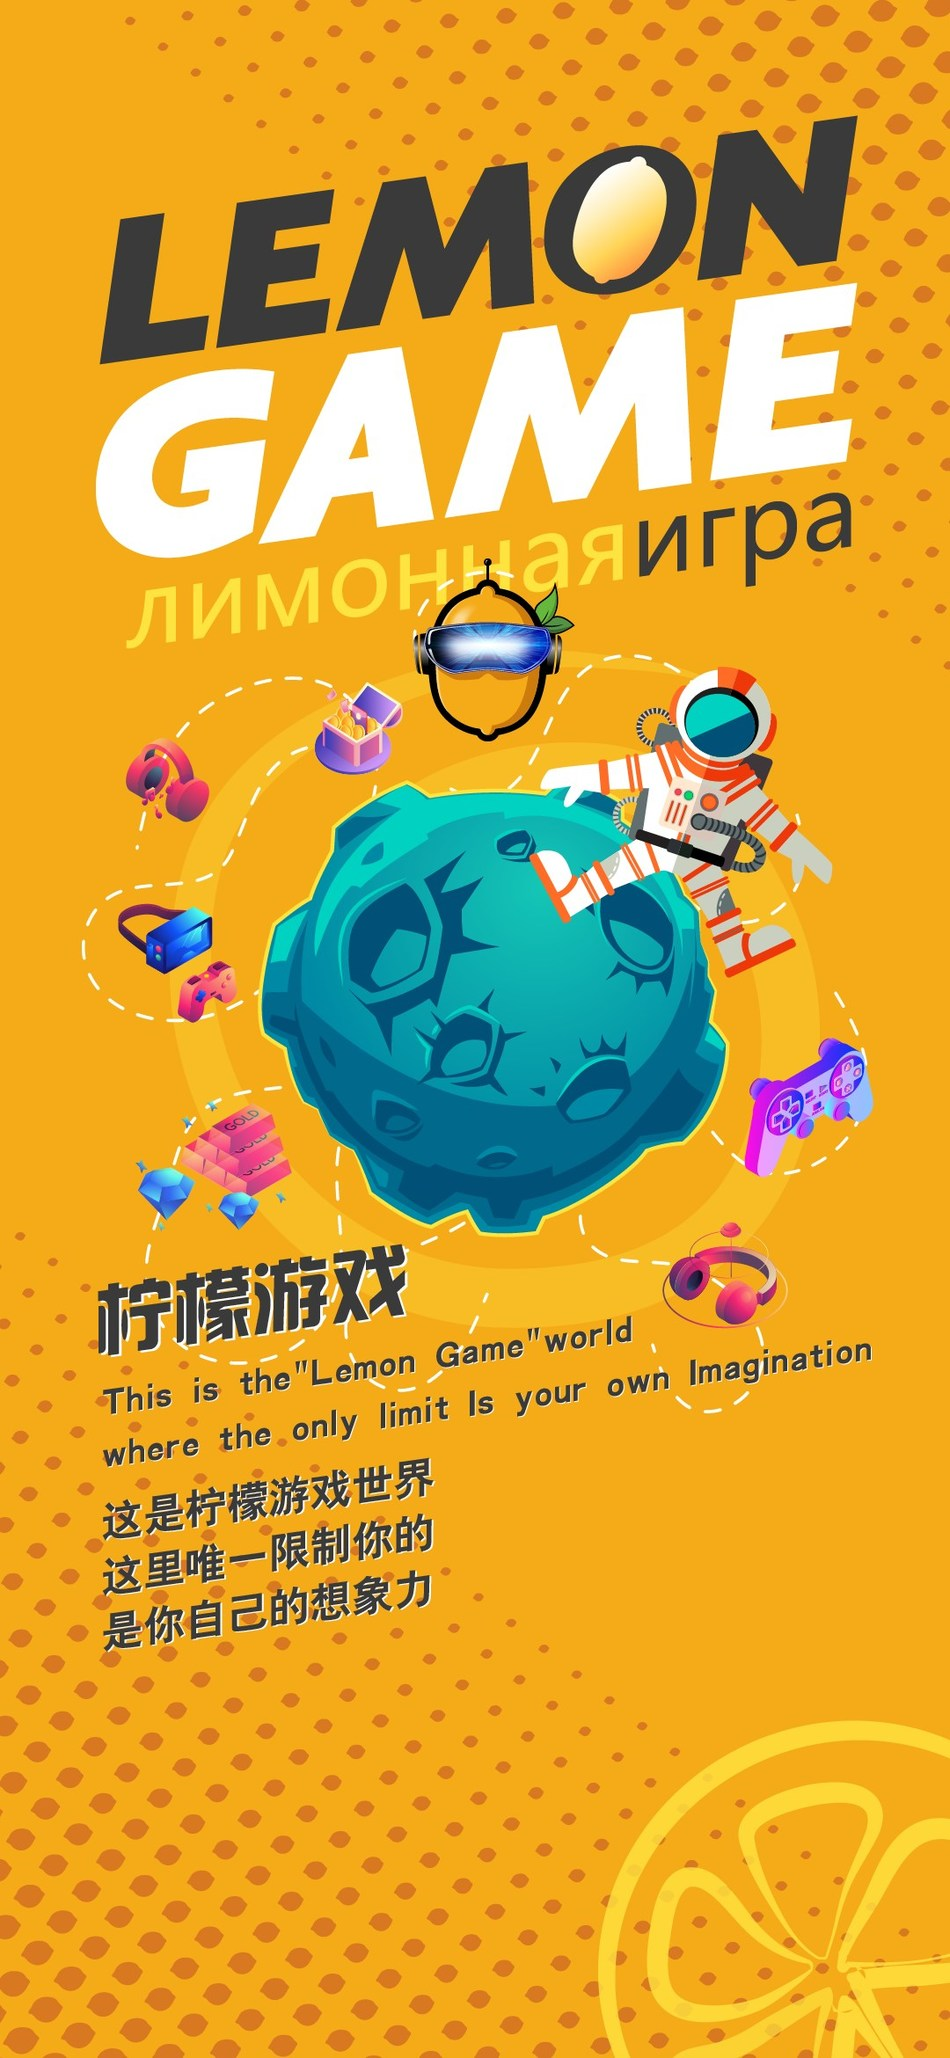 Lemon Game, a blockchain game distribution platform.